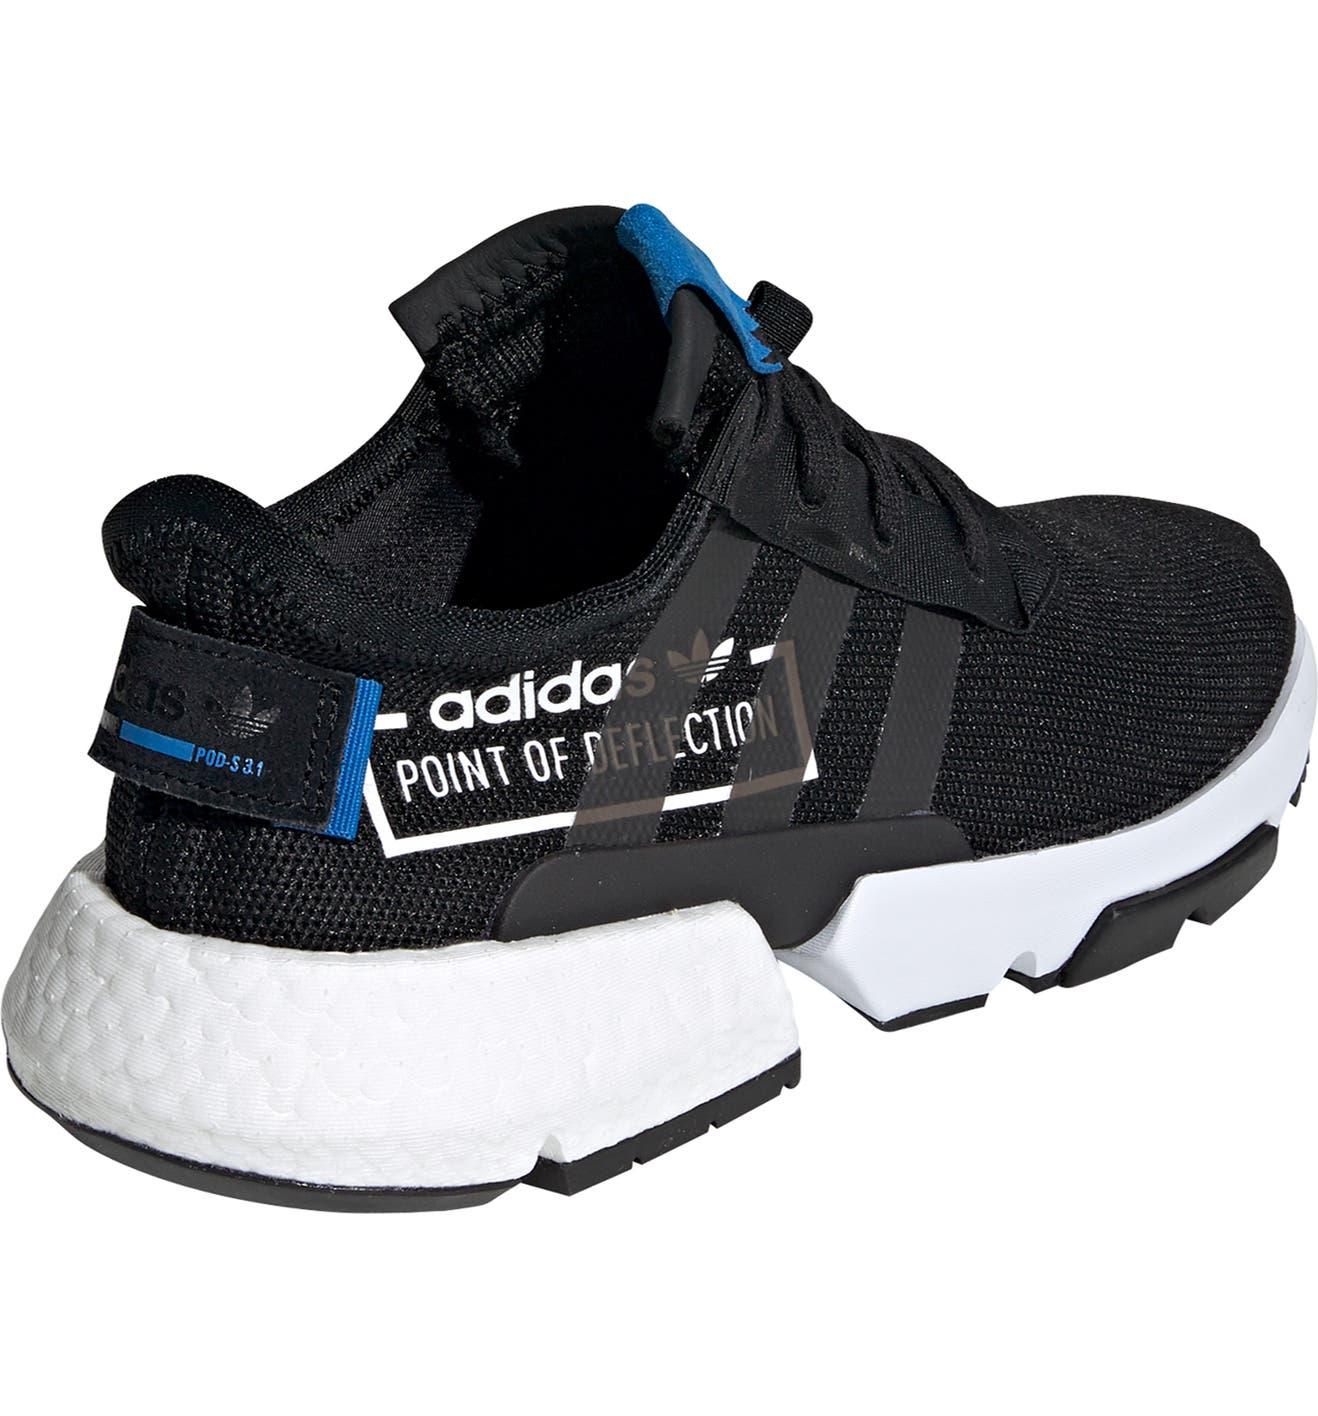 good service dirt cheap more photos Adidas pod s3.1 ladies. Foot Locker Europe. 2019-05-24